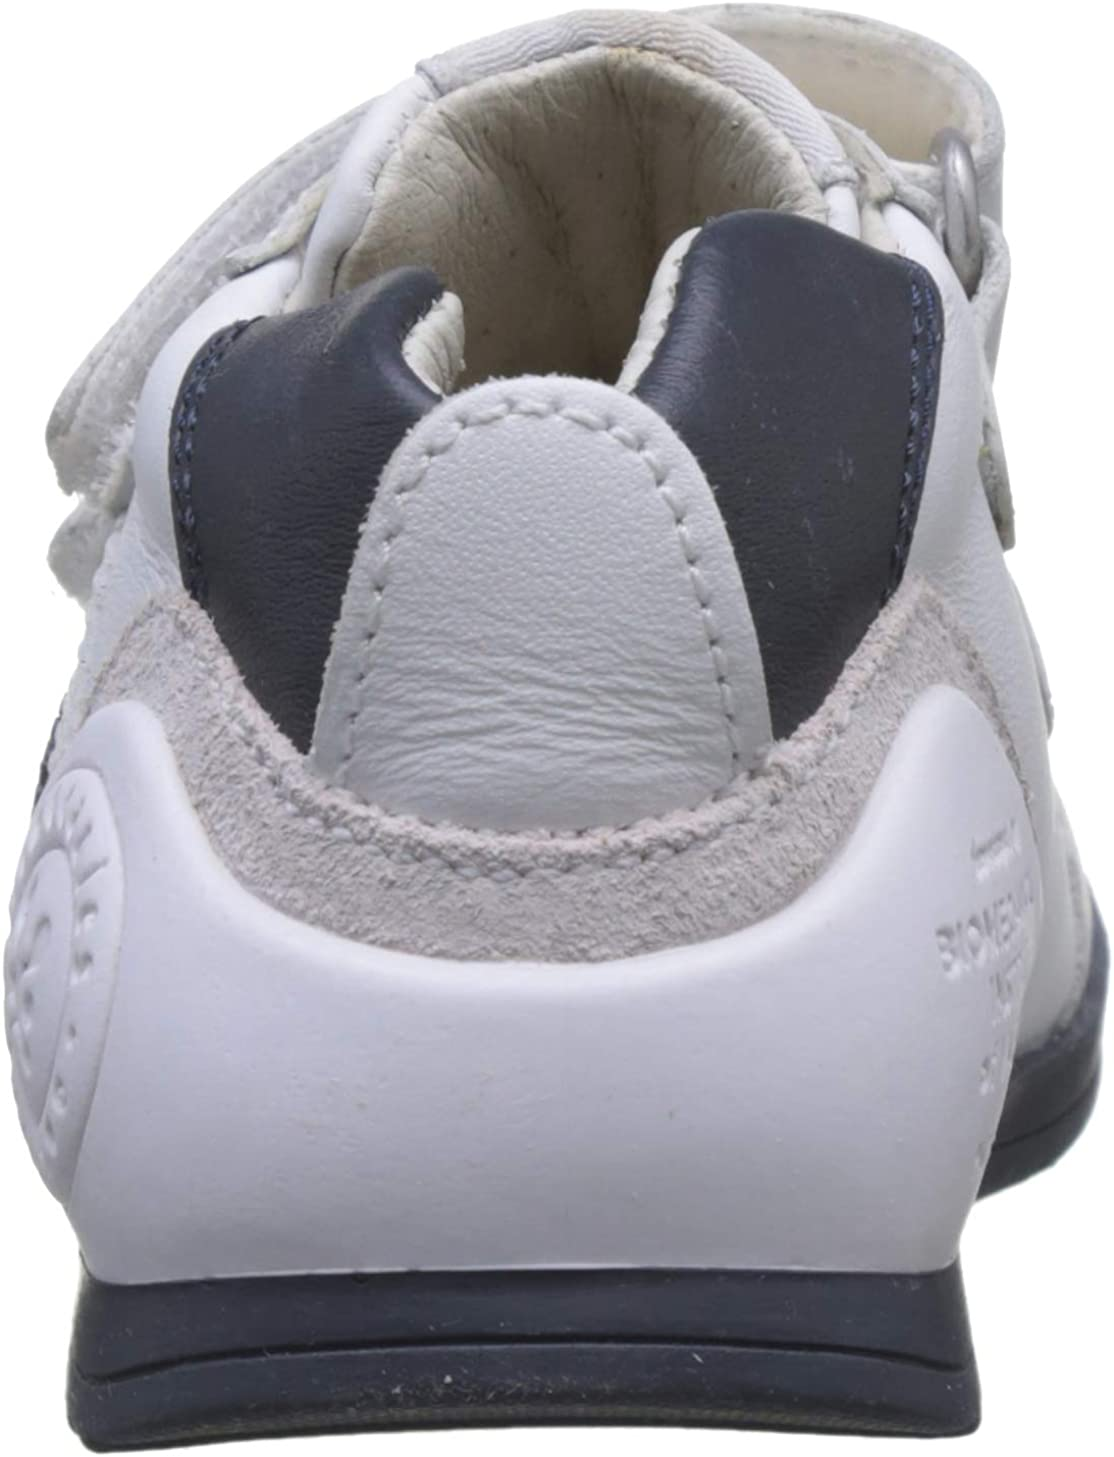 Biomecanics Unisex Babies/' 151157-1 Slippers